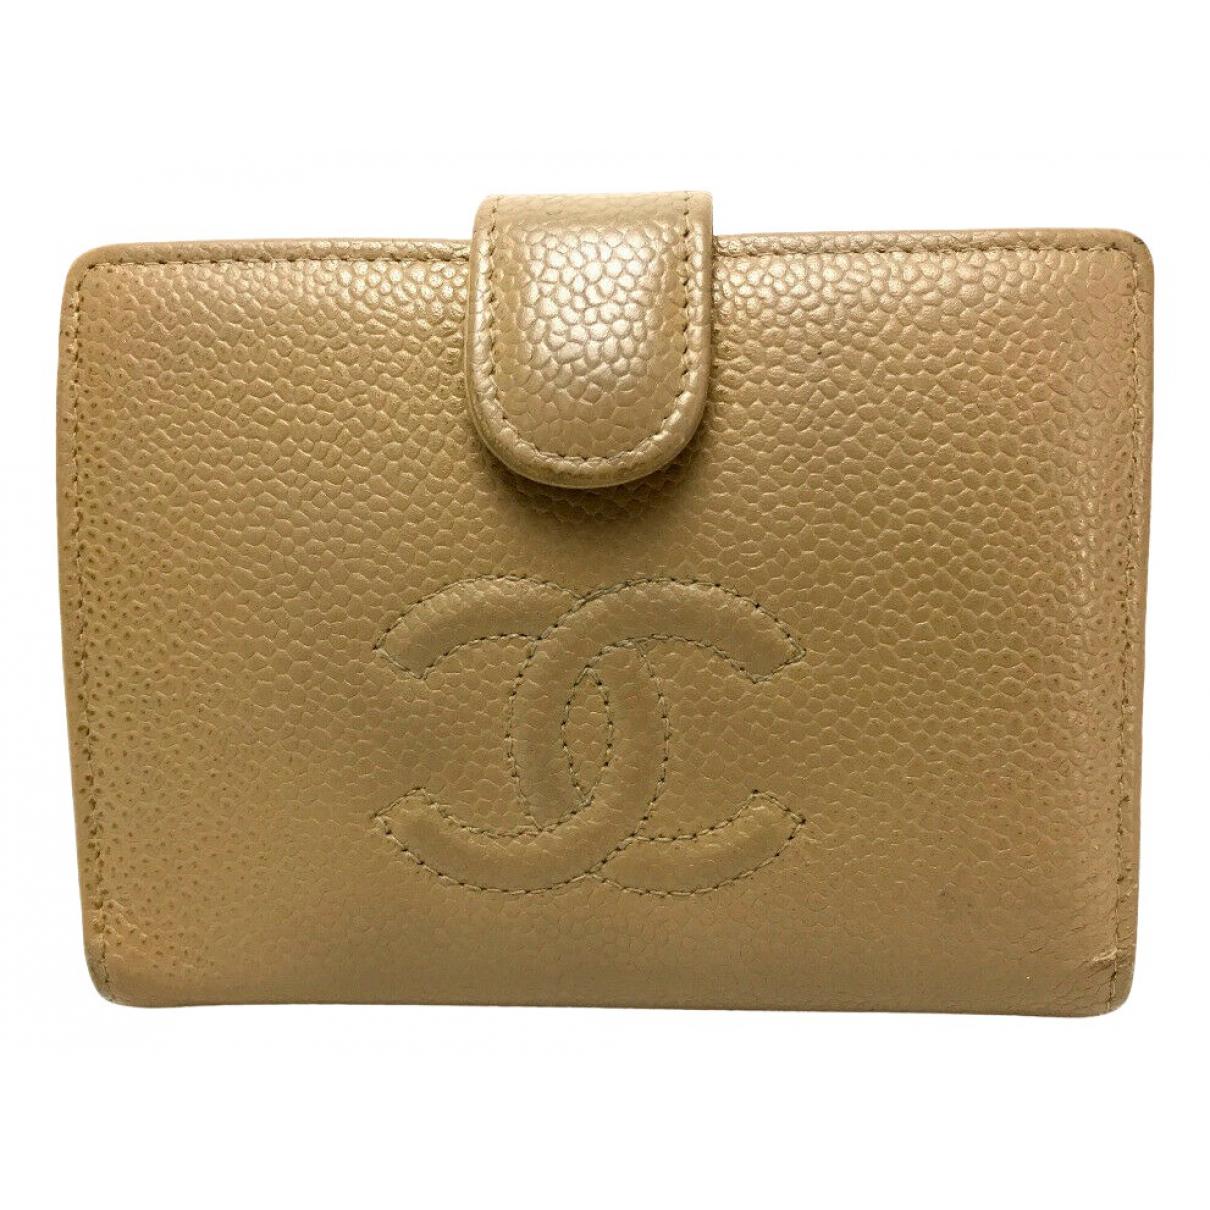 Chanel \N Portemonnaie in Leder